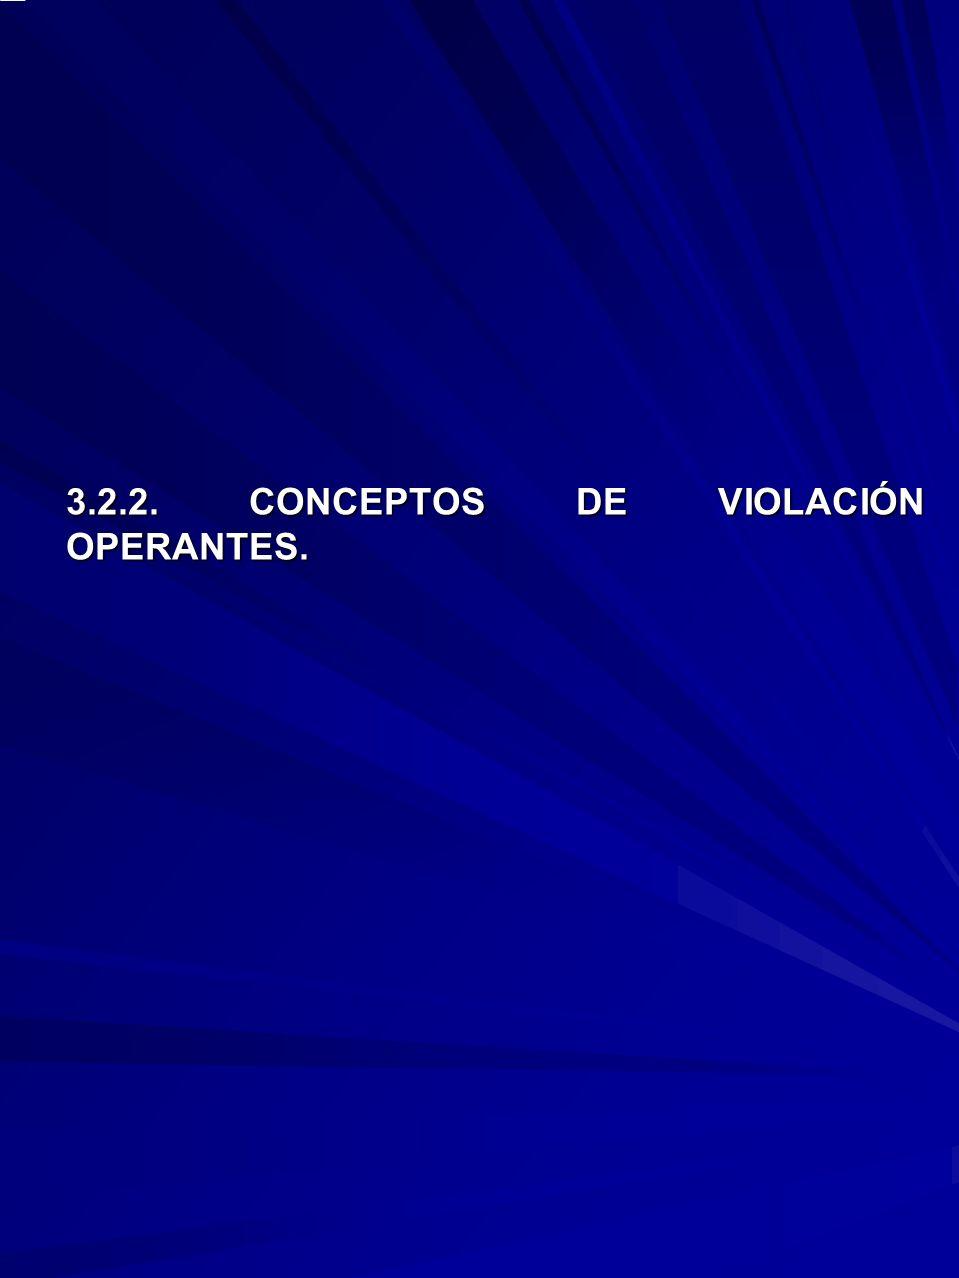 3.2.2. CONCEPTOS DE VIOLACIÓN OPERANTES.